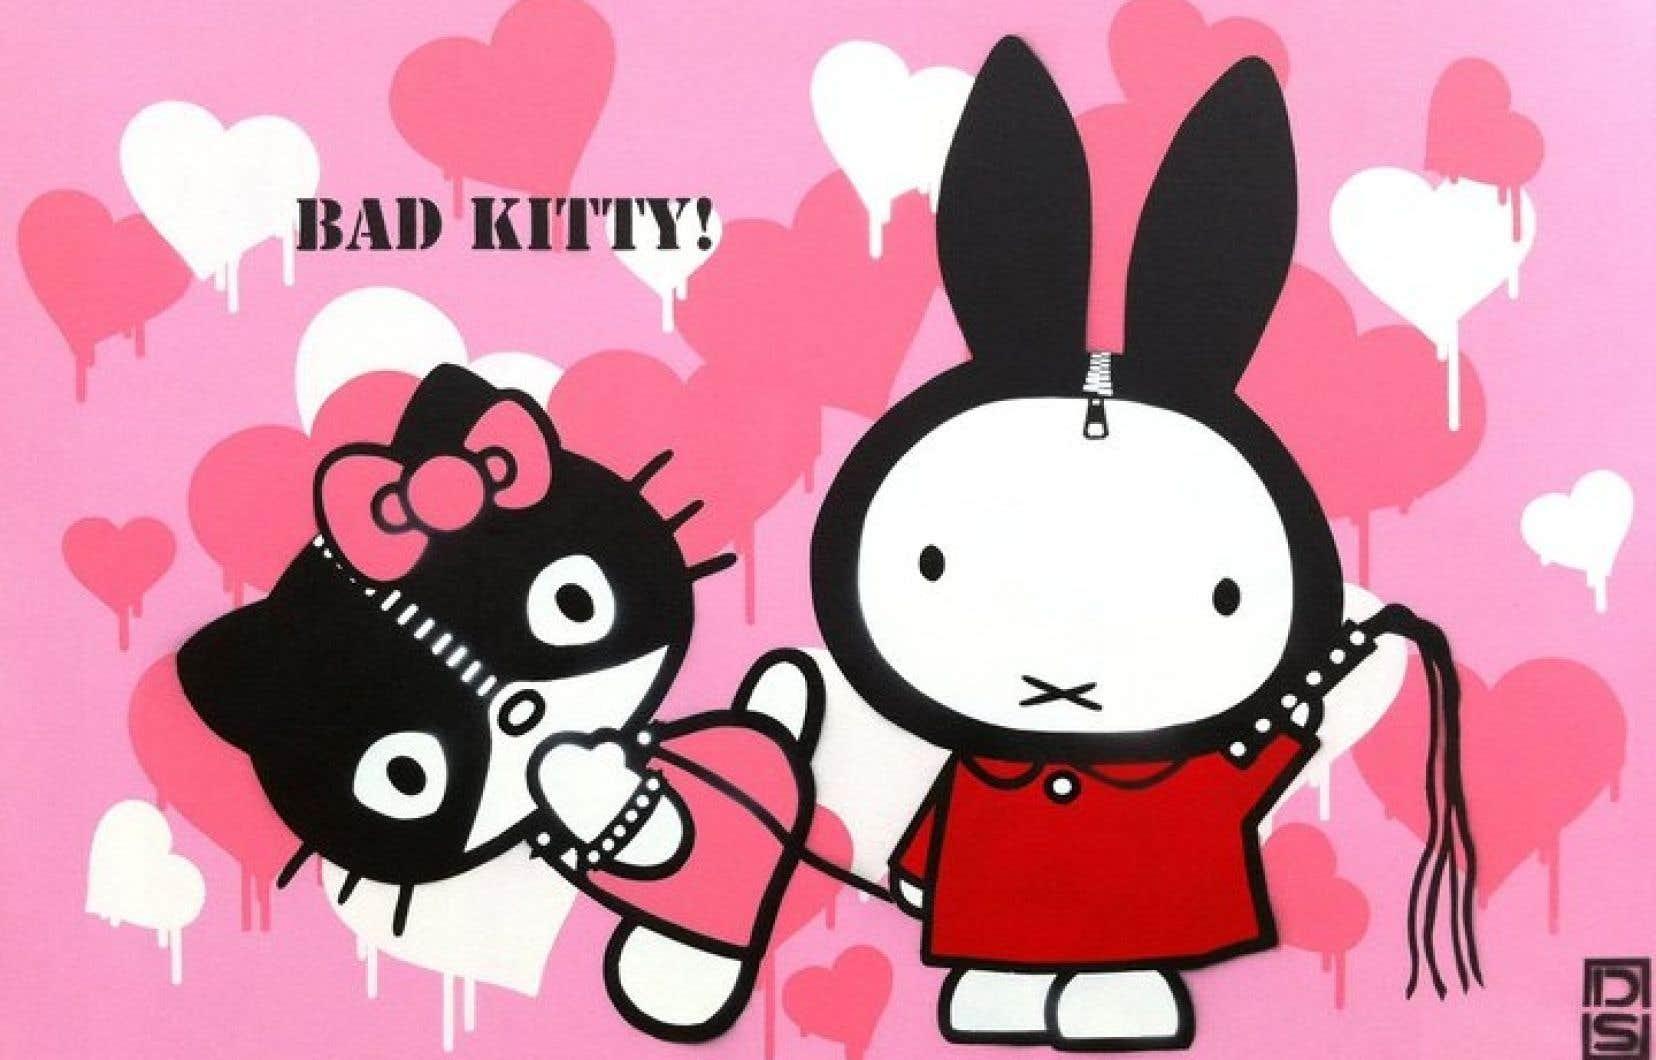 Le graffiti «Bad Kitty» de l'artiste DS.